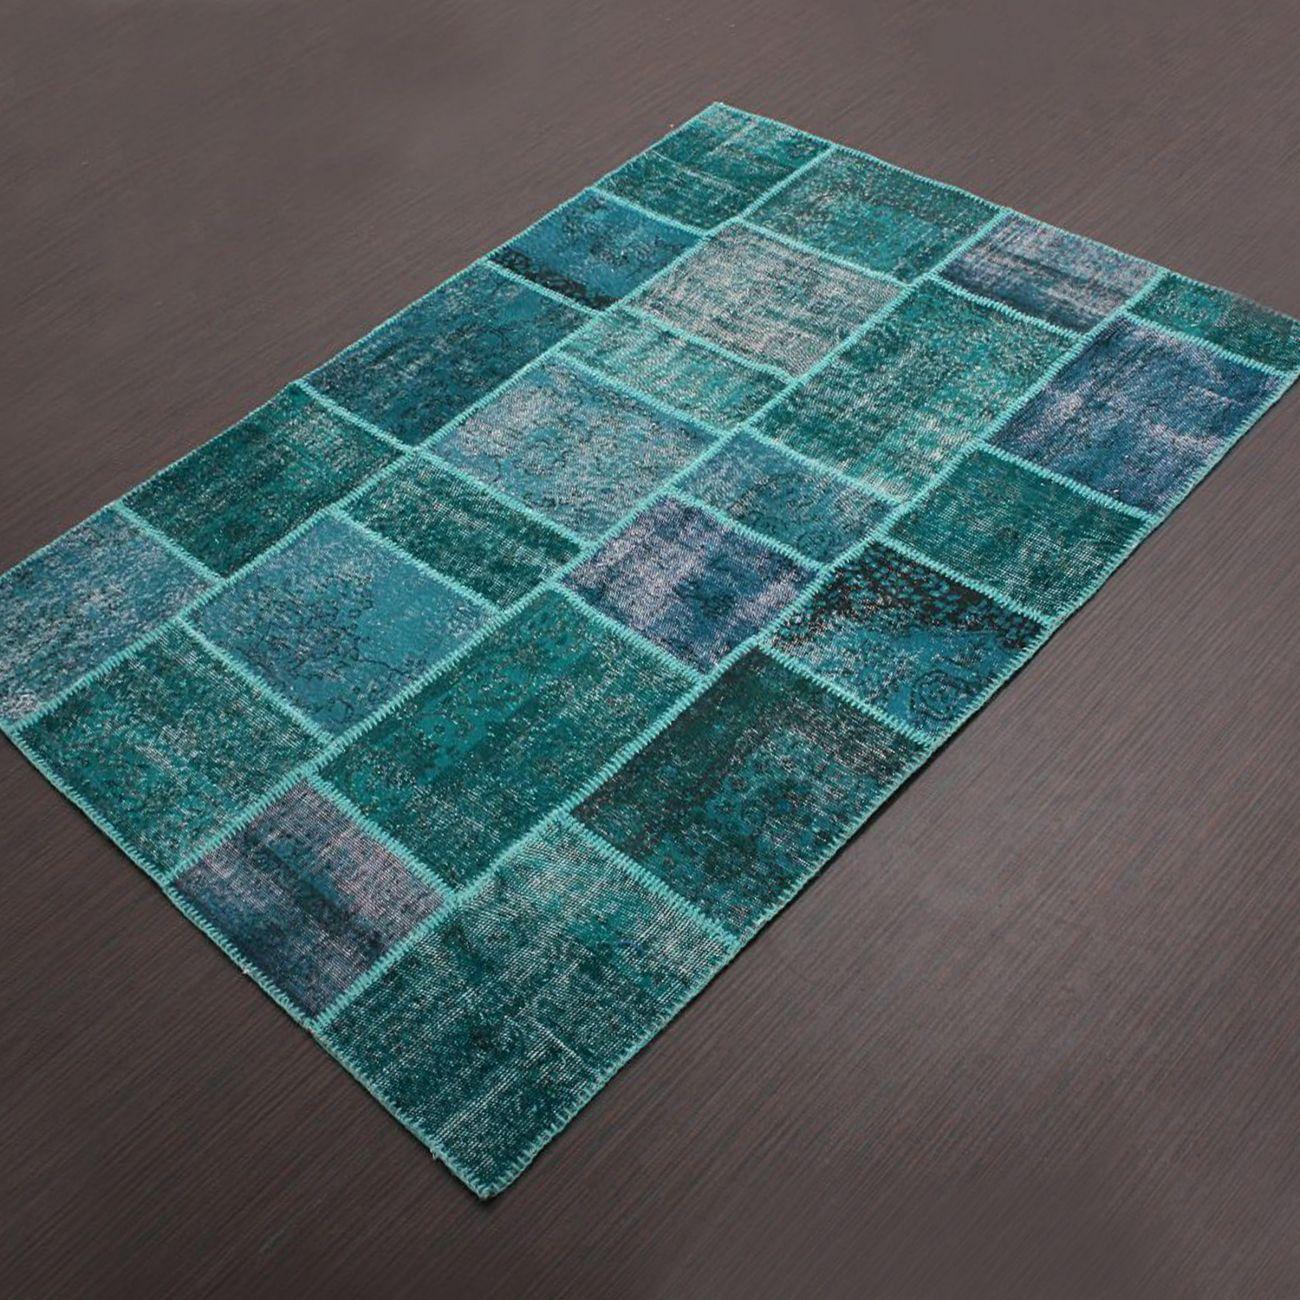 FB,52949,23,liviadora-patchwork-hali-turkuaz-patchwork-hali